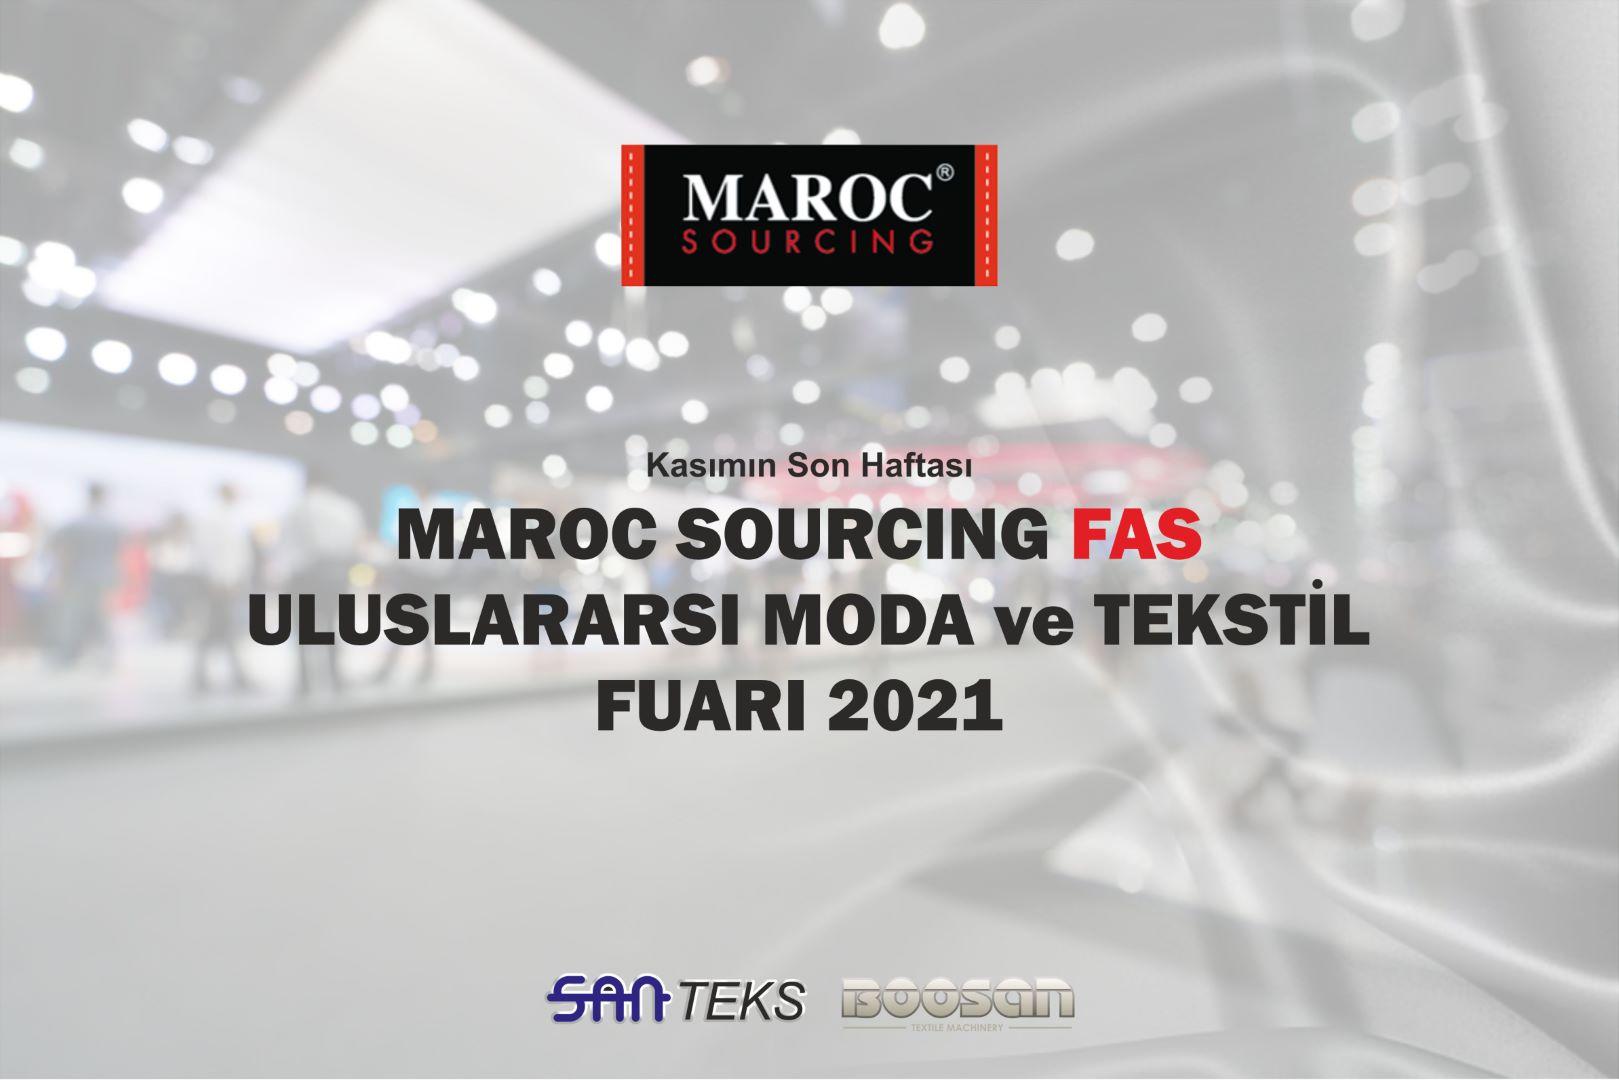 Fas Maroc Sourcing Moda ve Tekstil Fuarı 2021